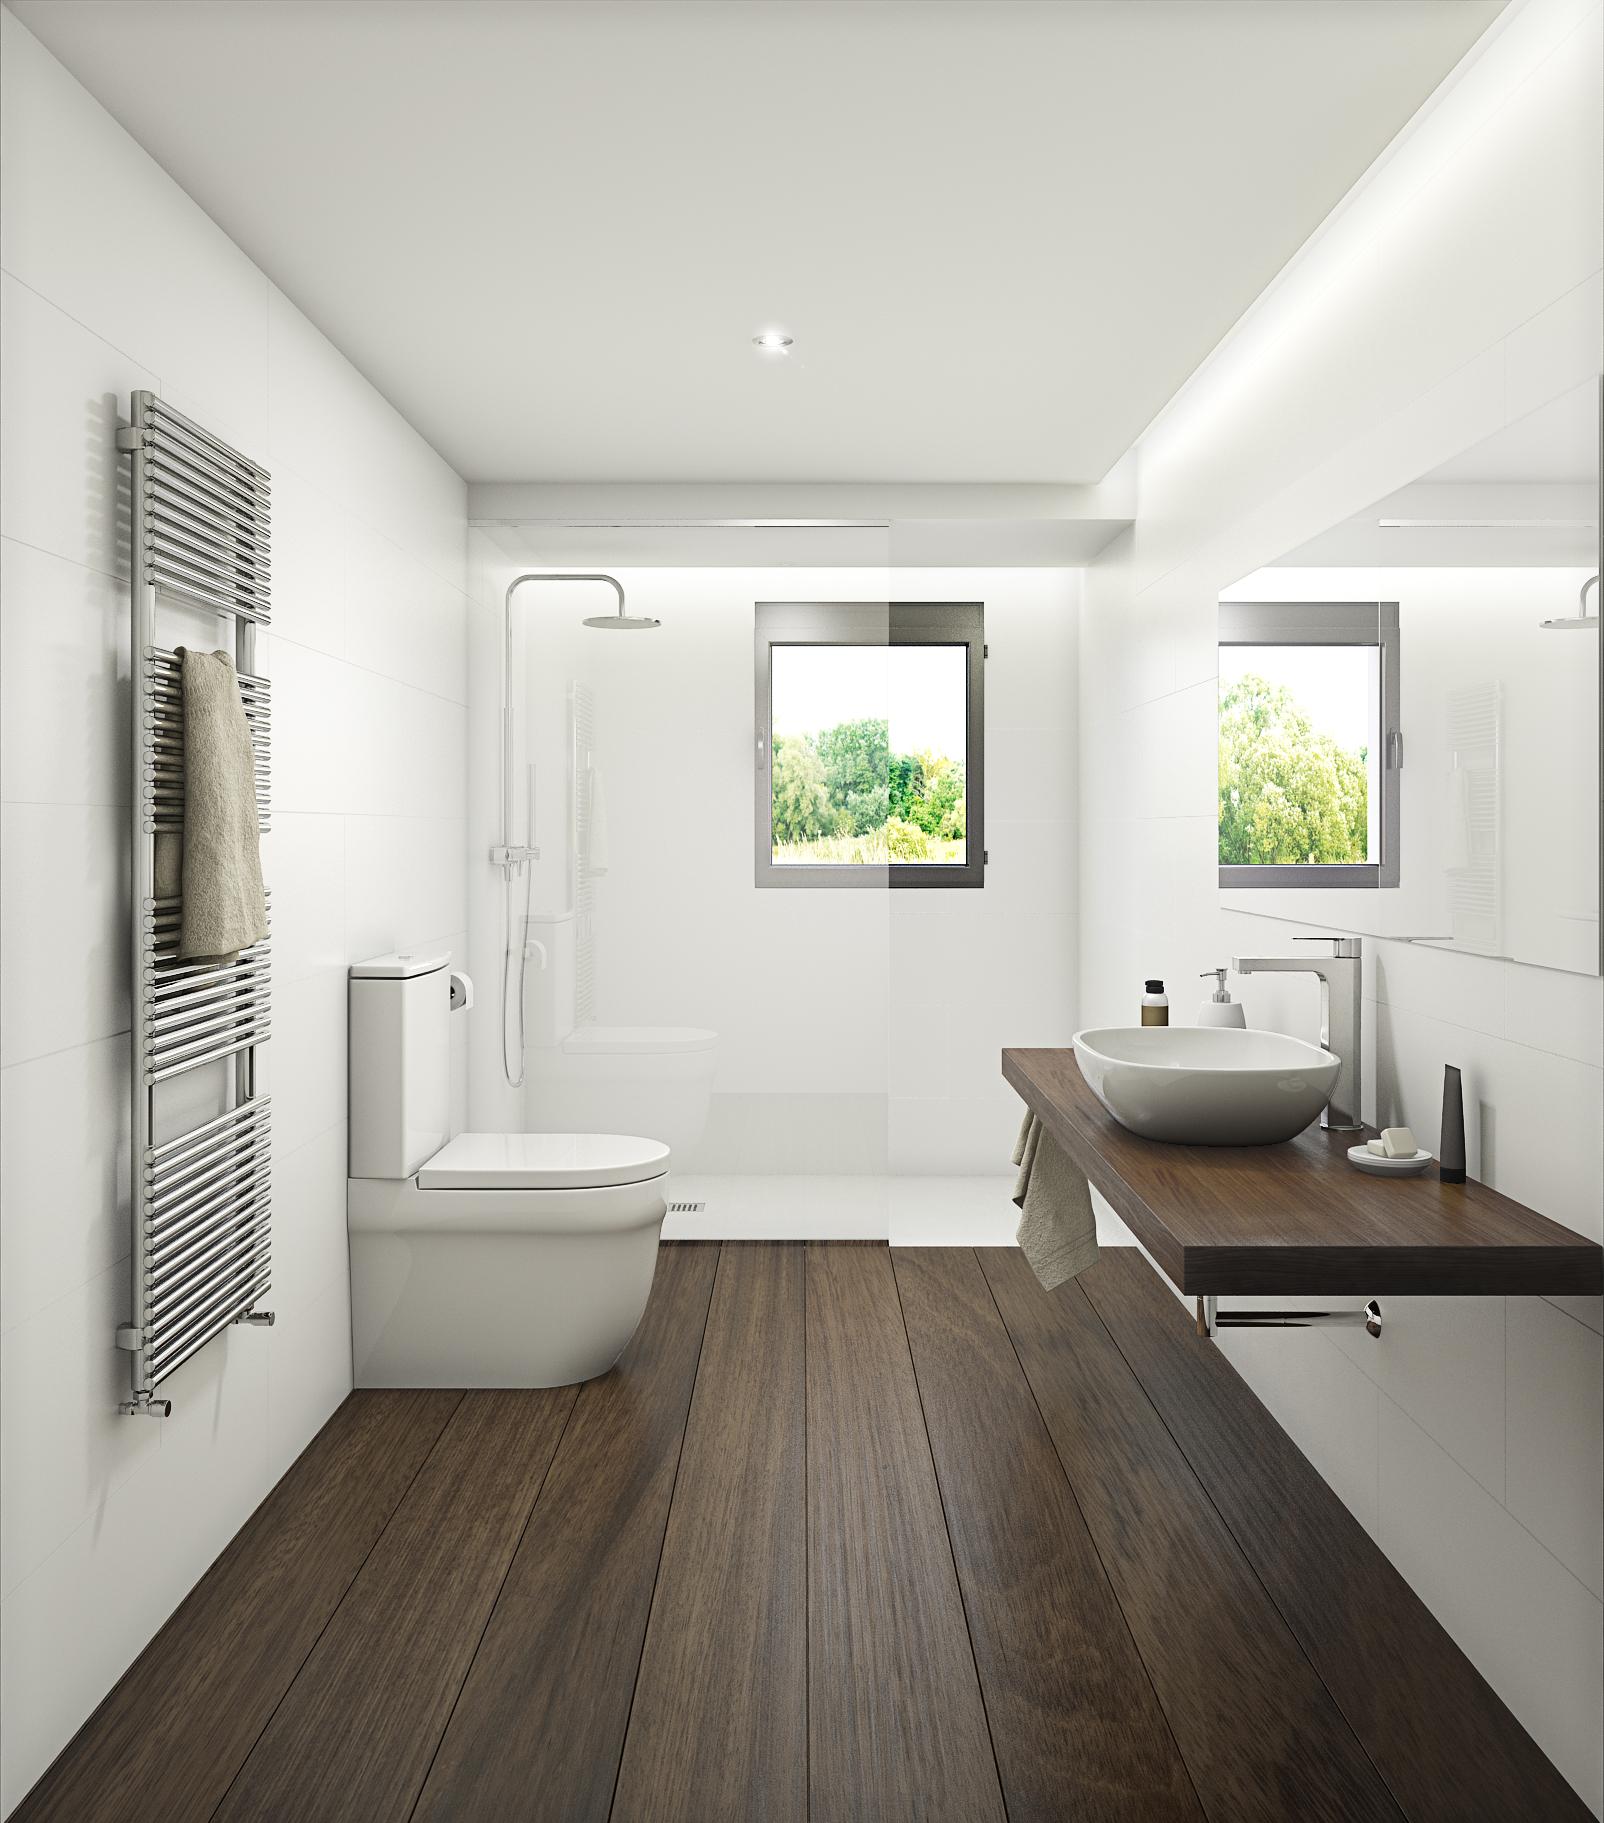 Castellmoster Bathrooms